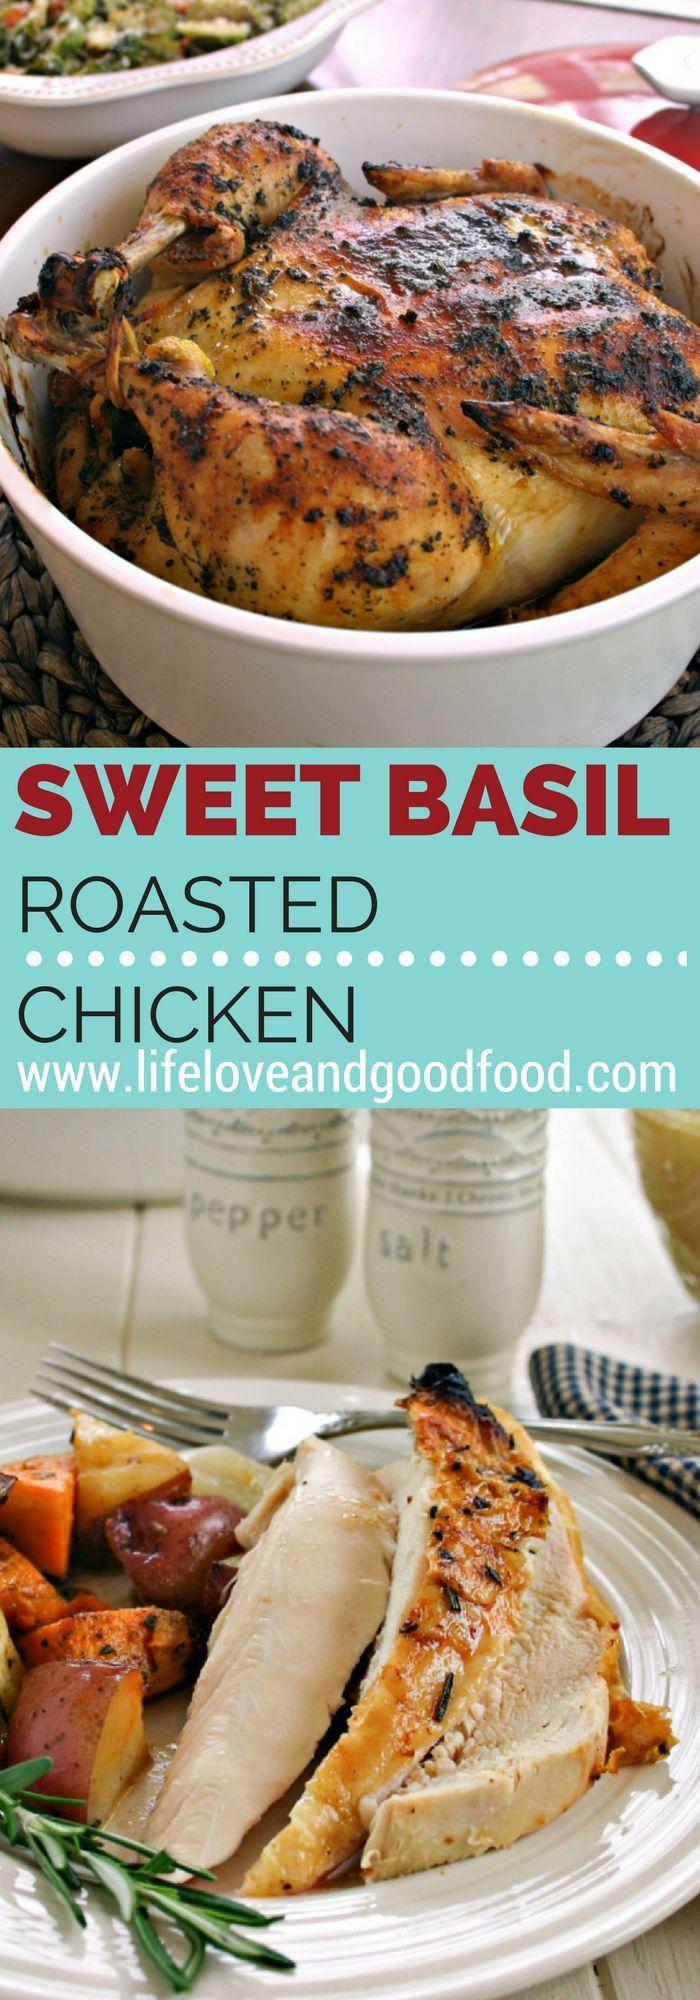 Sweet Basil Roasted Chicken   Recipe   Pinterest   Chicken life ...